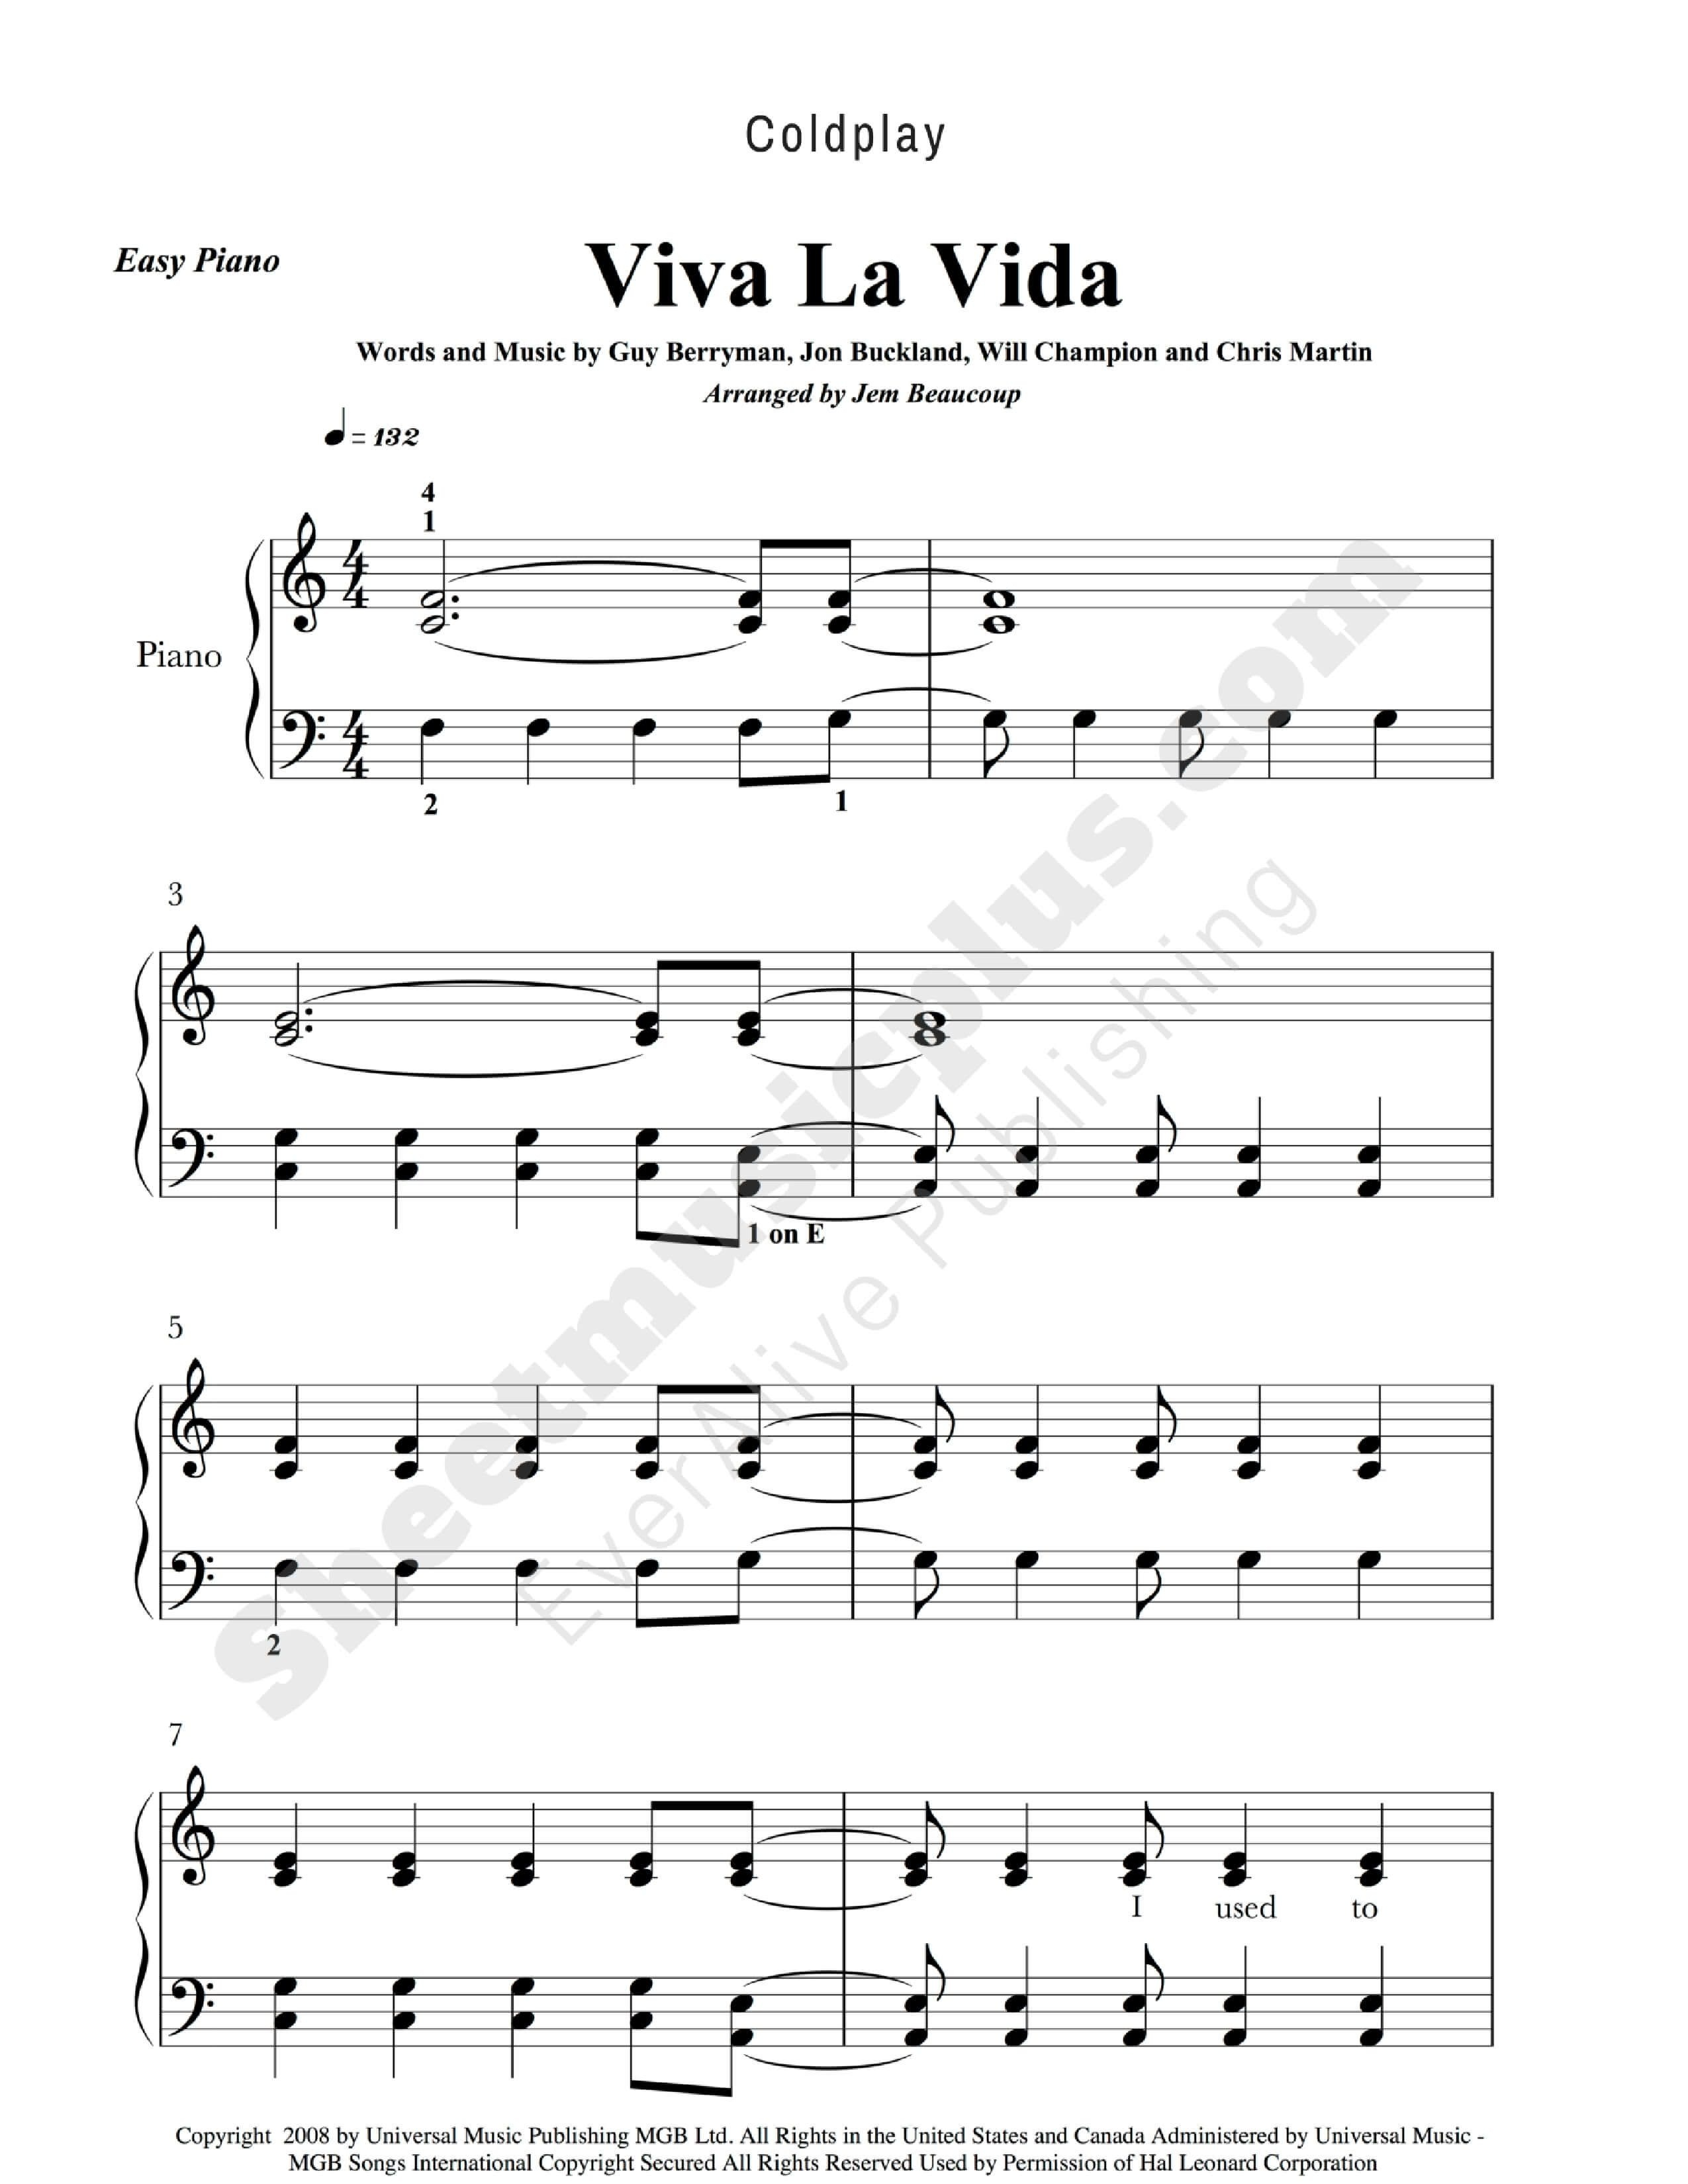 Coldplay Viva La Vida Easy Piano Music. Download And Print - Free Piano Sheet Music Online Printable Popular Songs